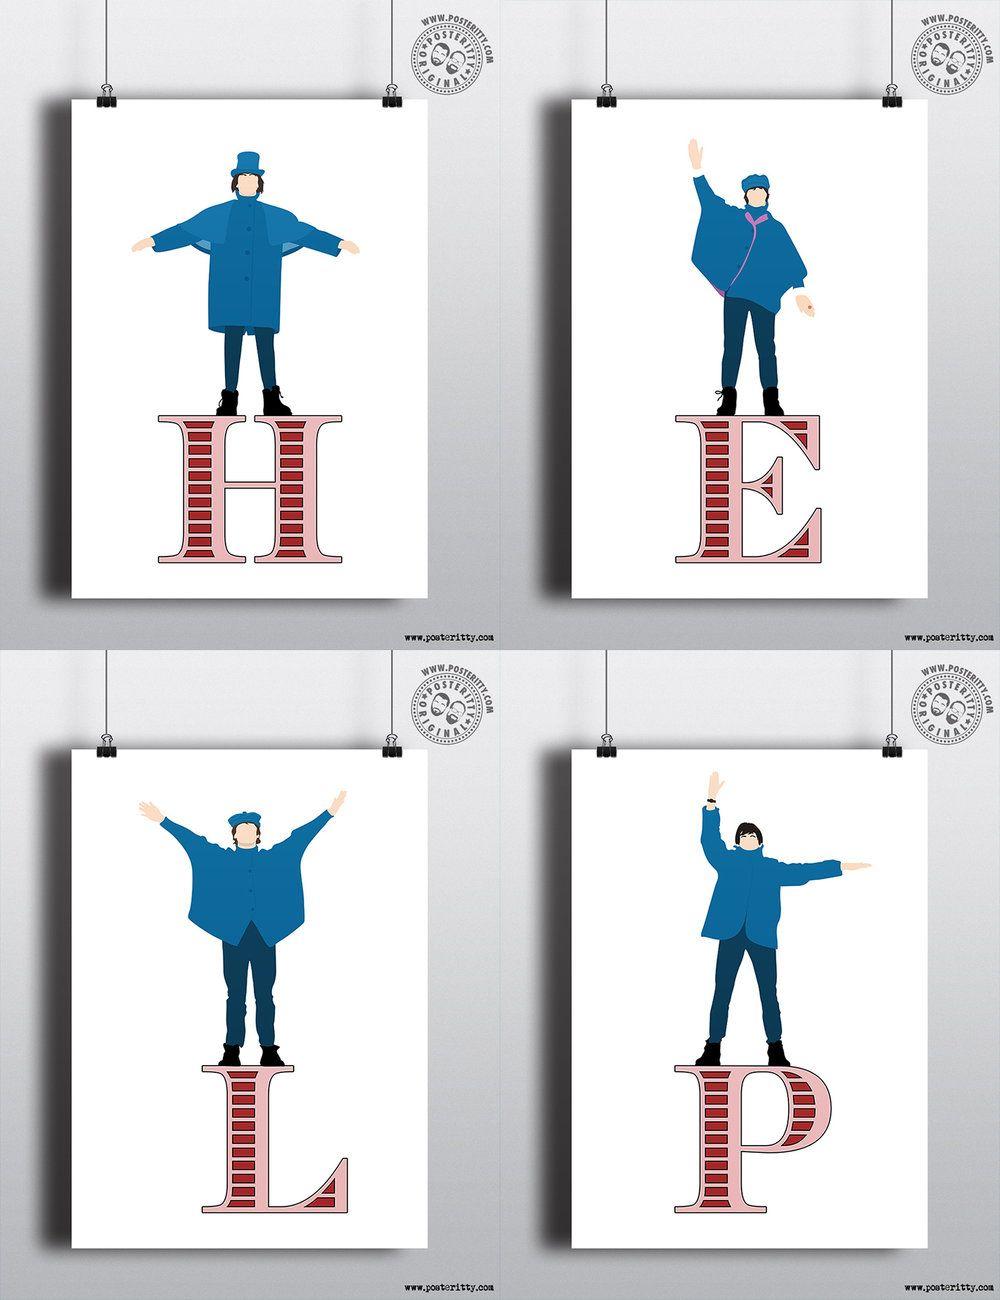 Poster design help - Beatles Help Minimal Music Poster Design By Posteritty Posteritty Minimalposters Minimalistic